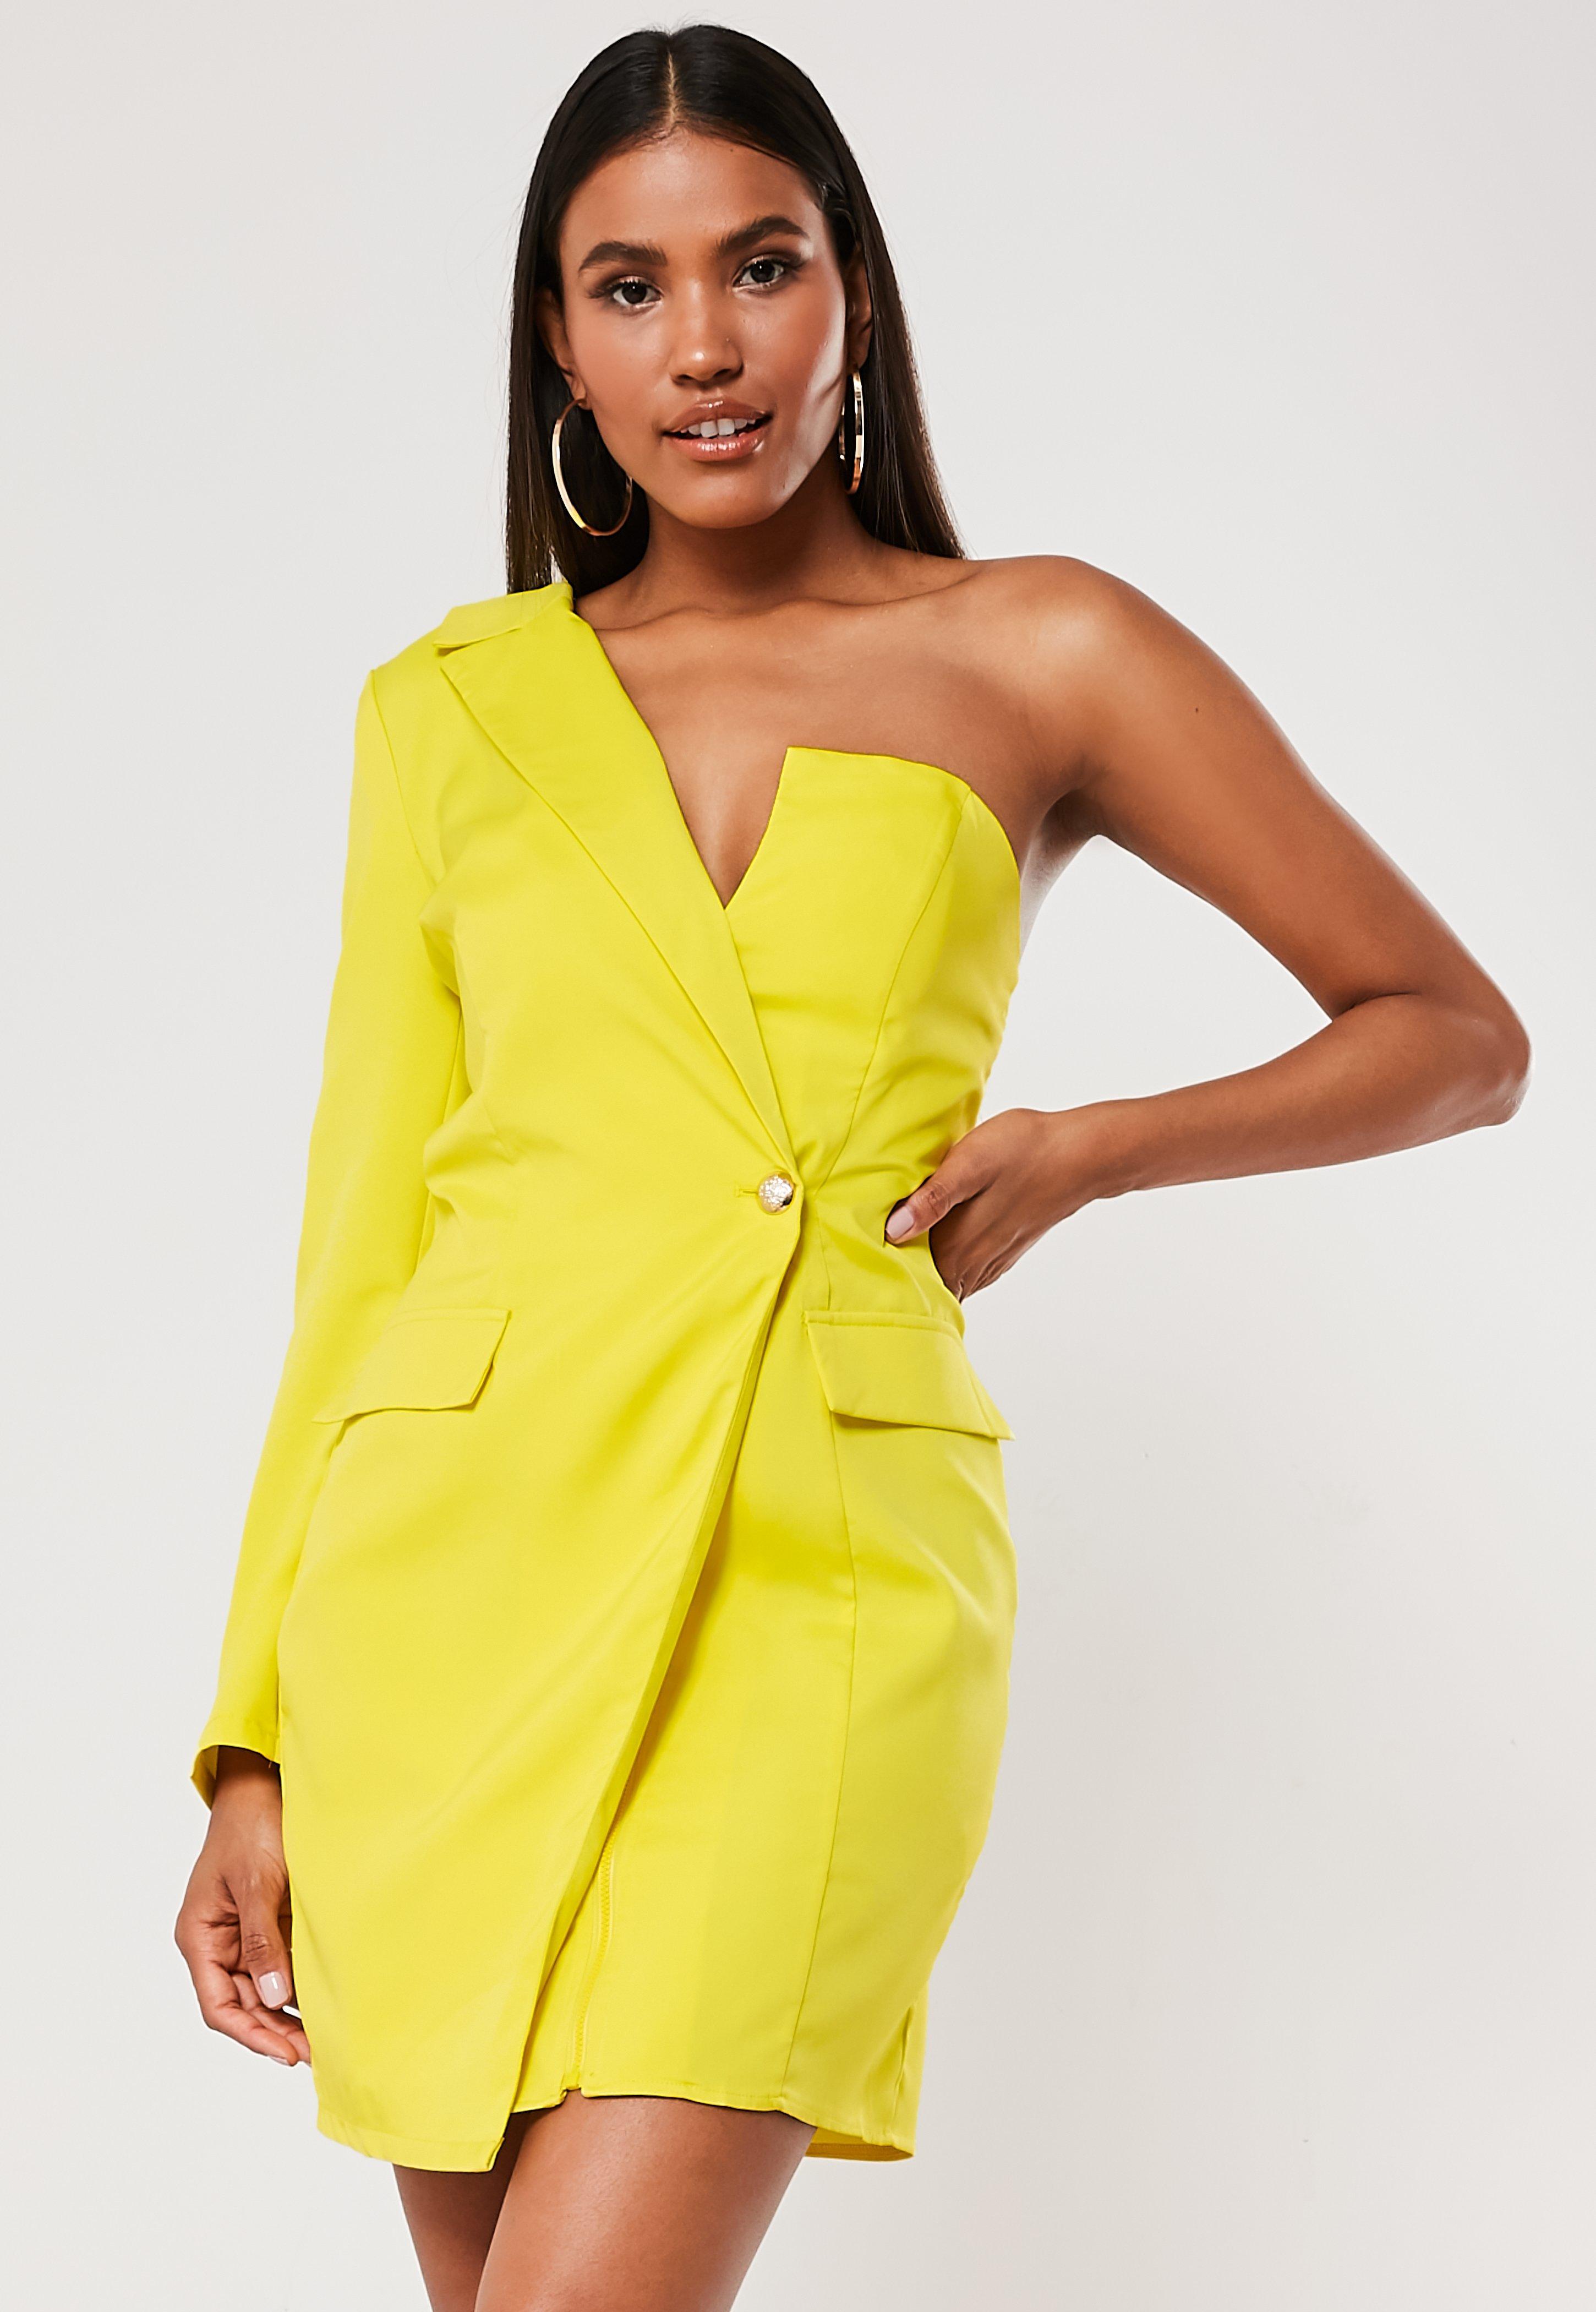 f9246c4b6d5ccf Dresses UK | Women's Dresses Online | Missguided